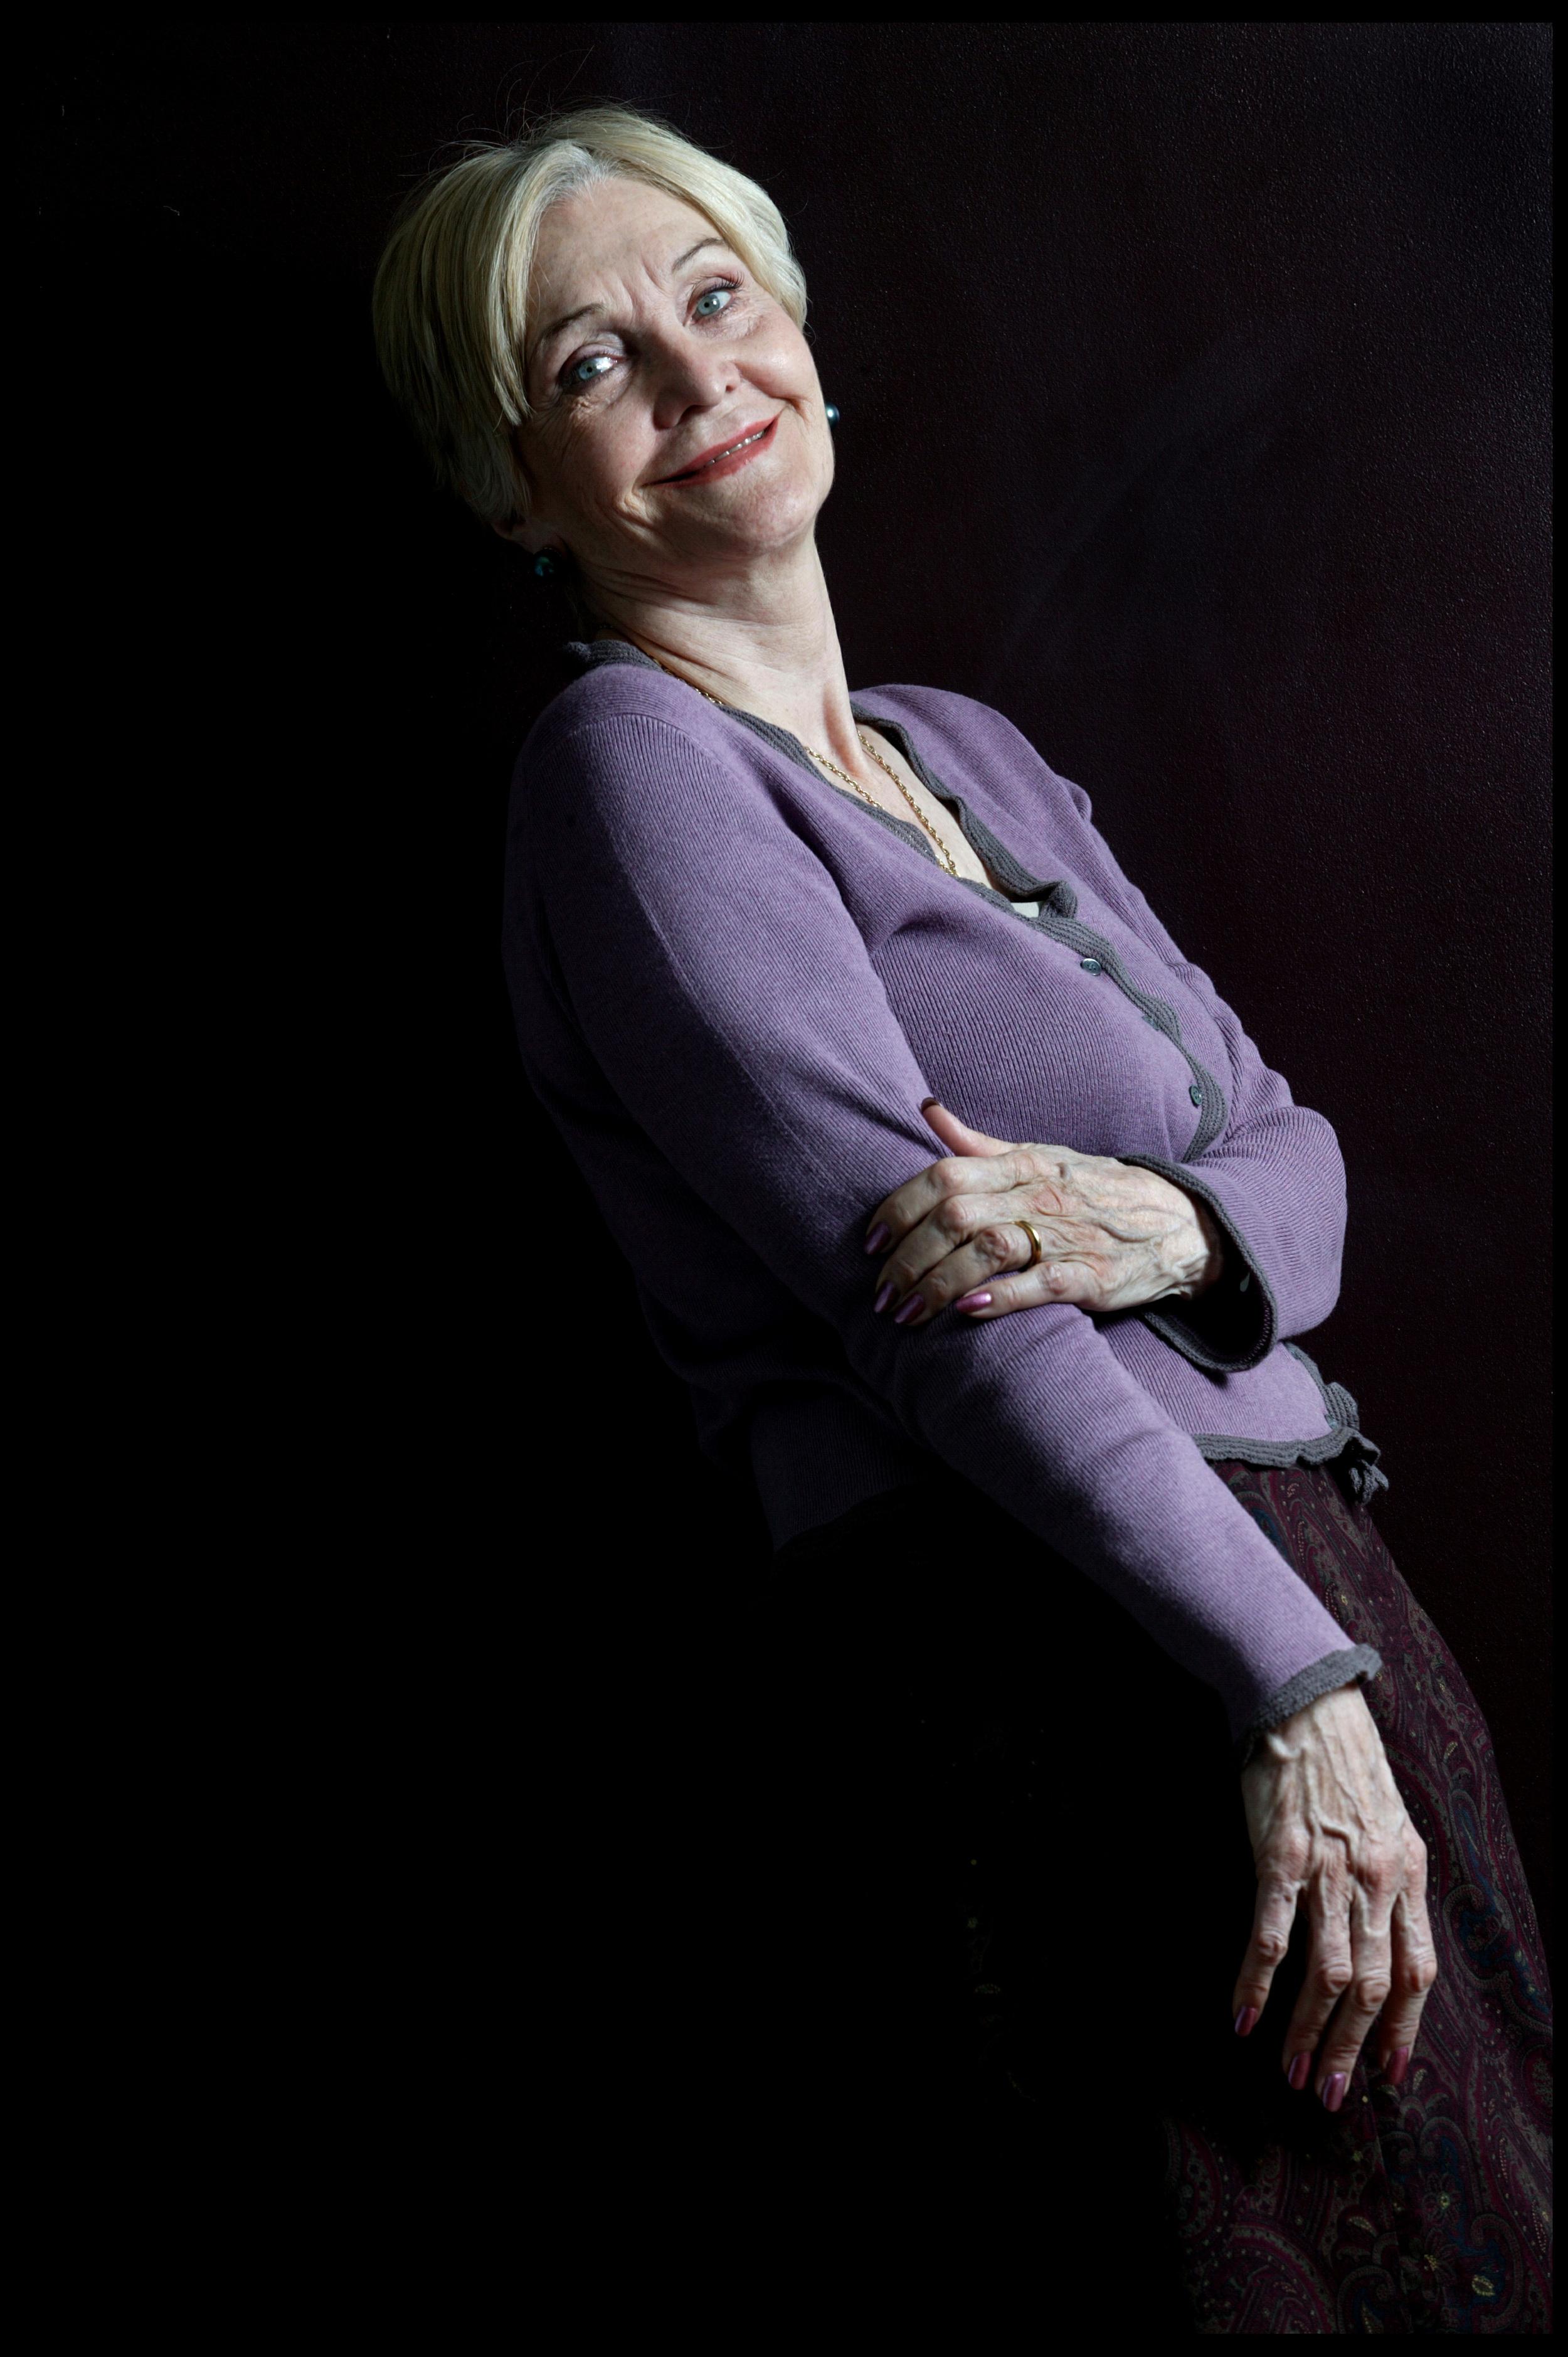 Sheila Hancock, actress, writer